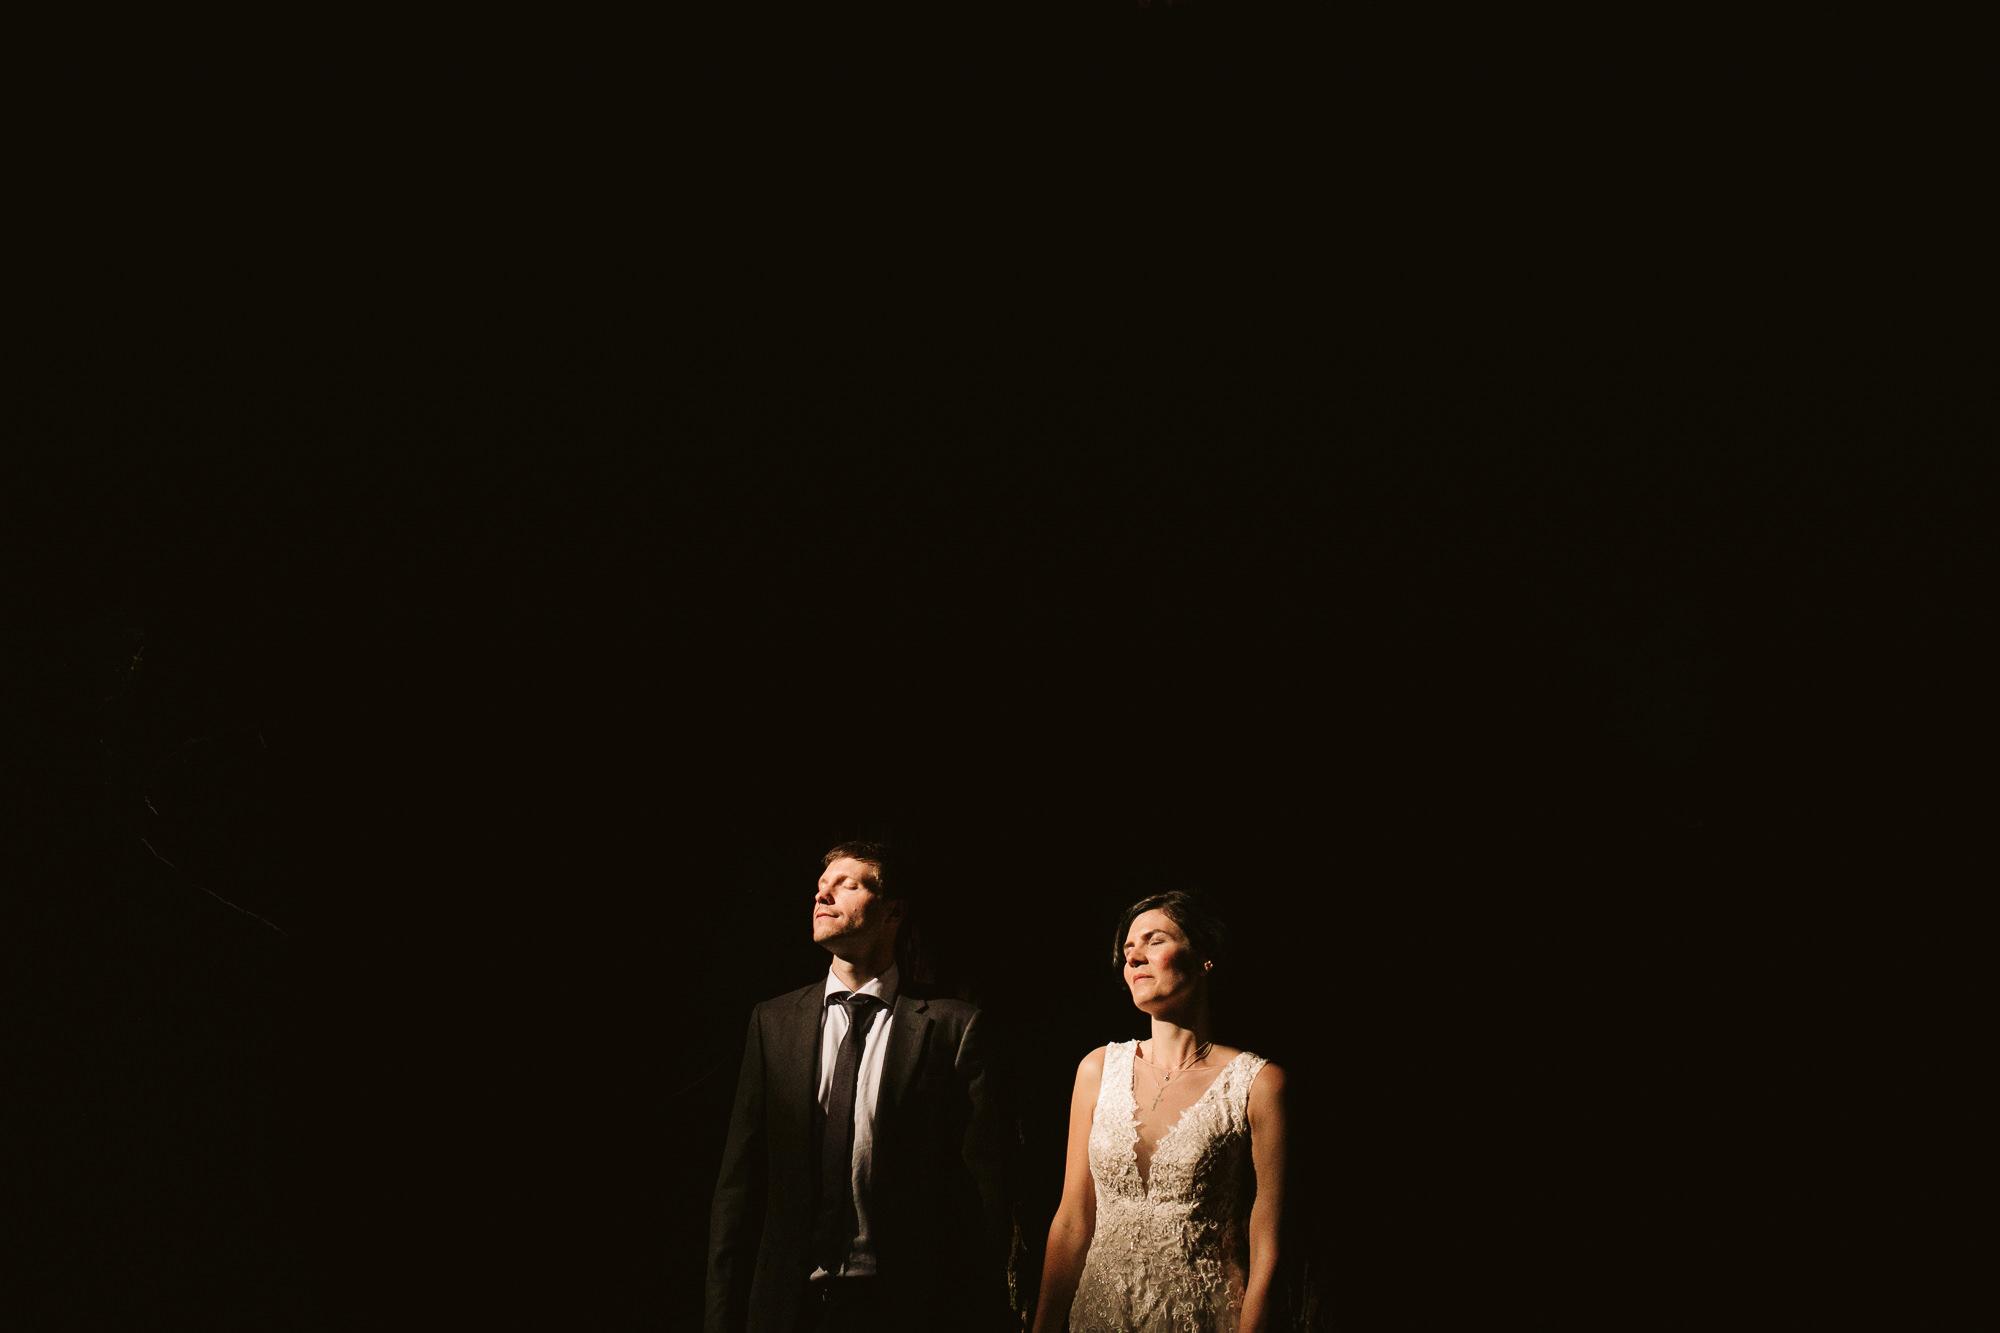 California-wedding-photographer-alfonso-flores-pamplin-groove-286.jpg